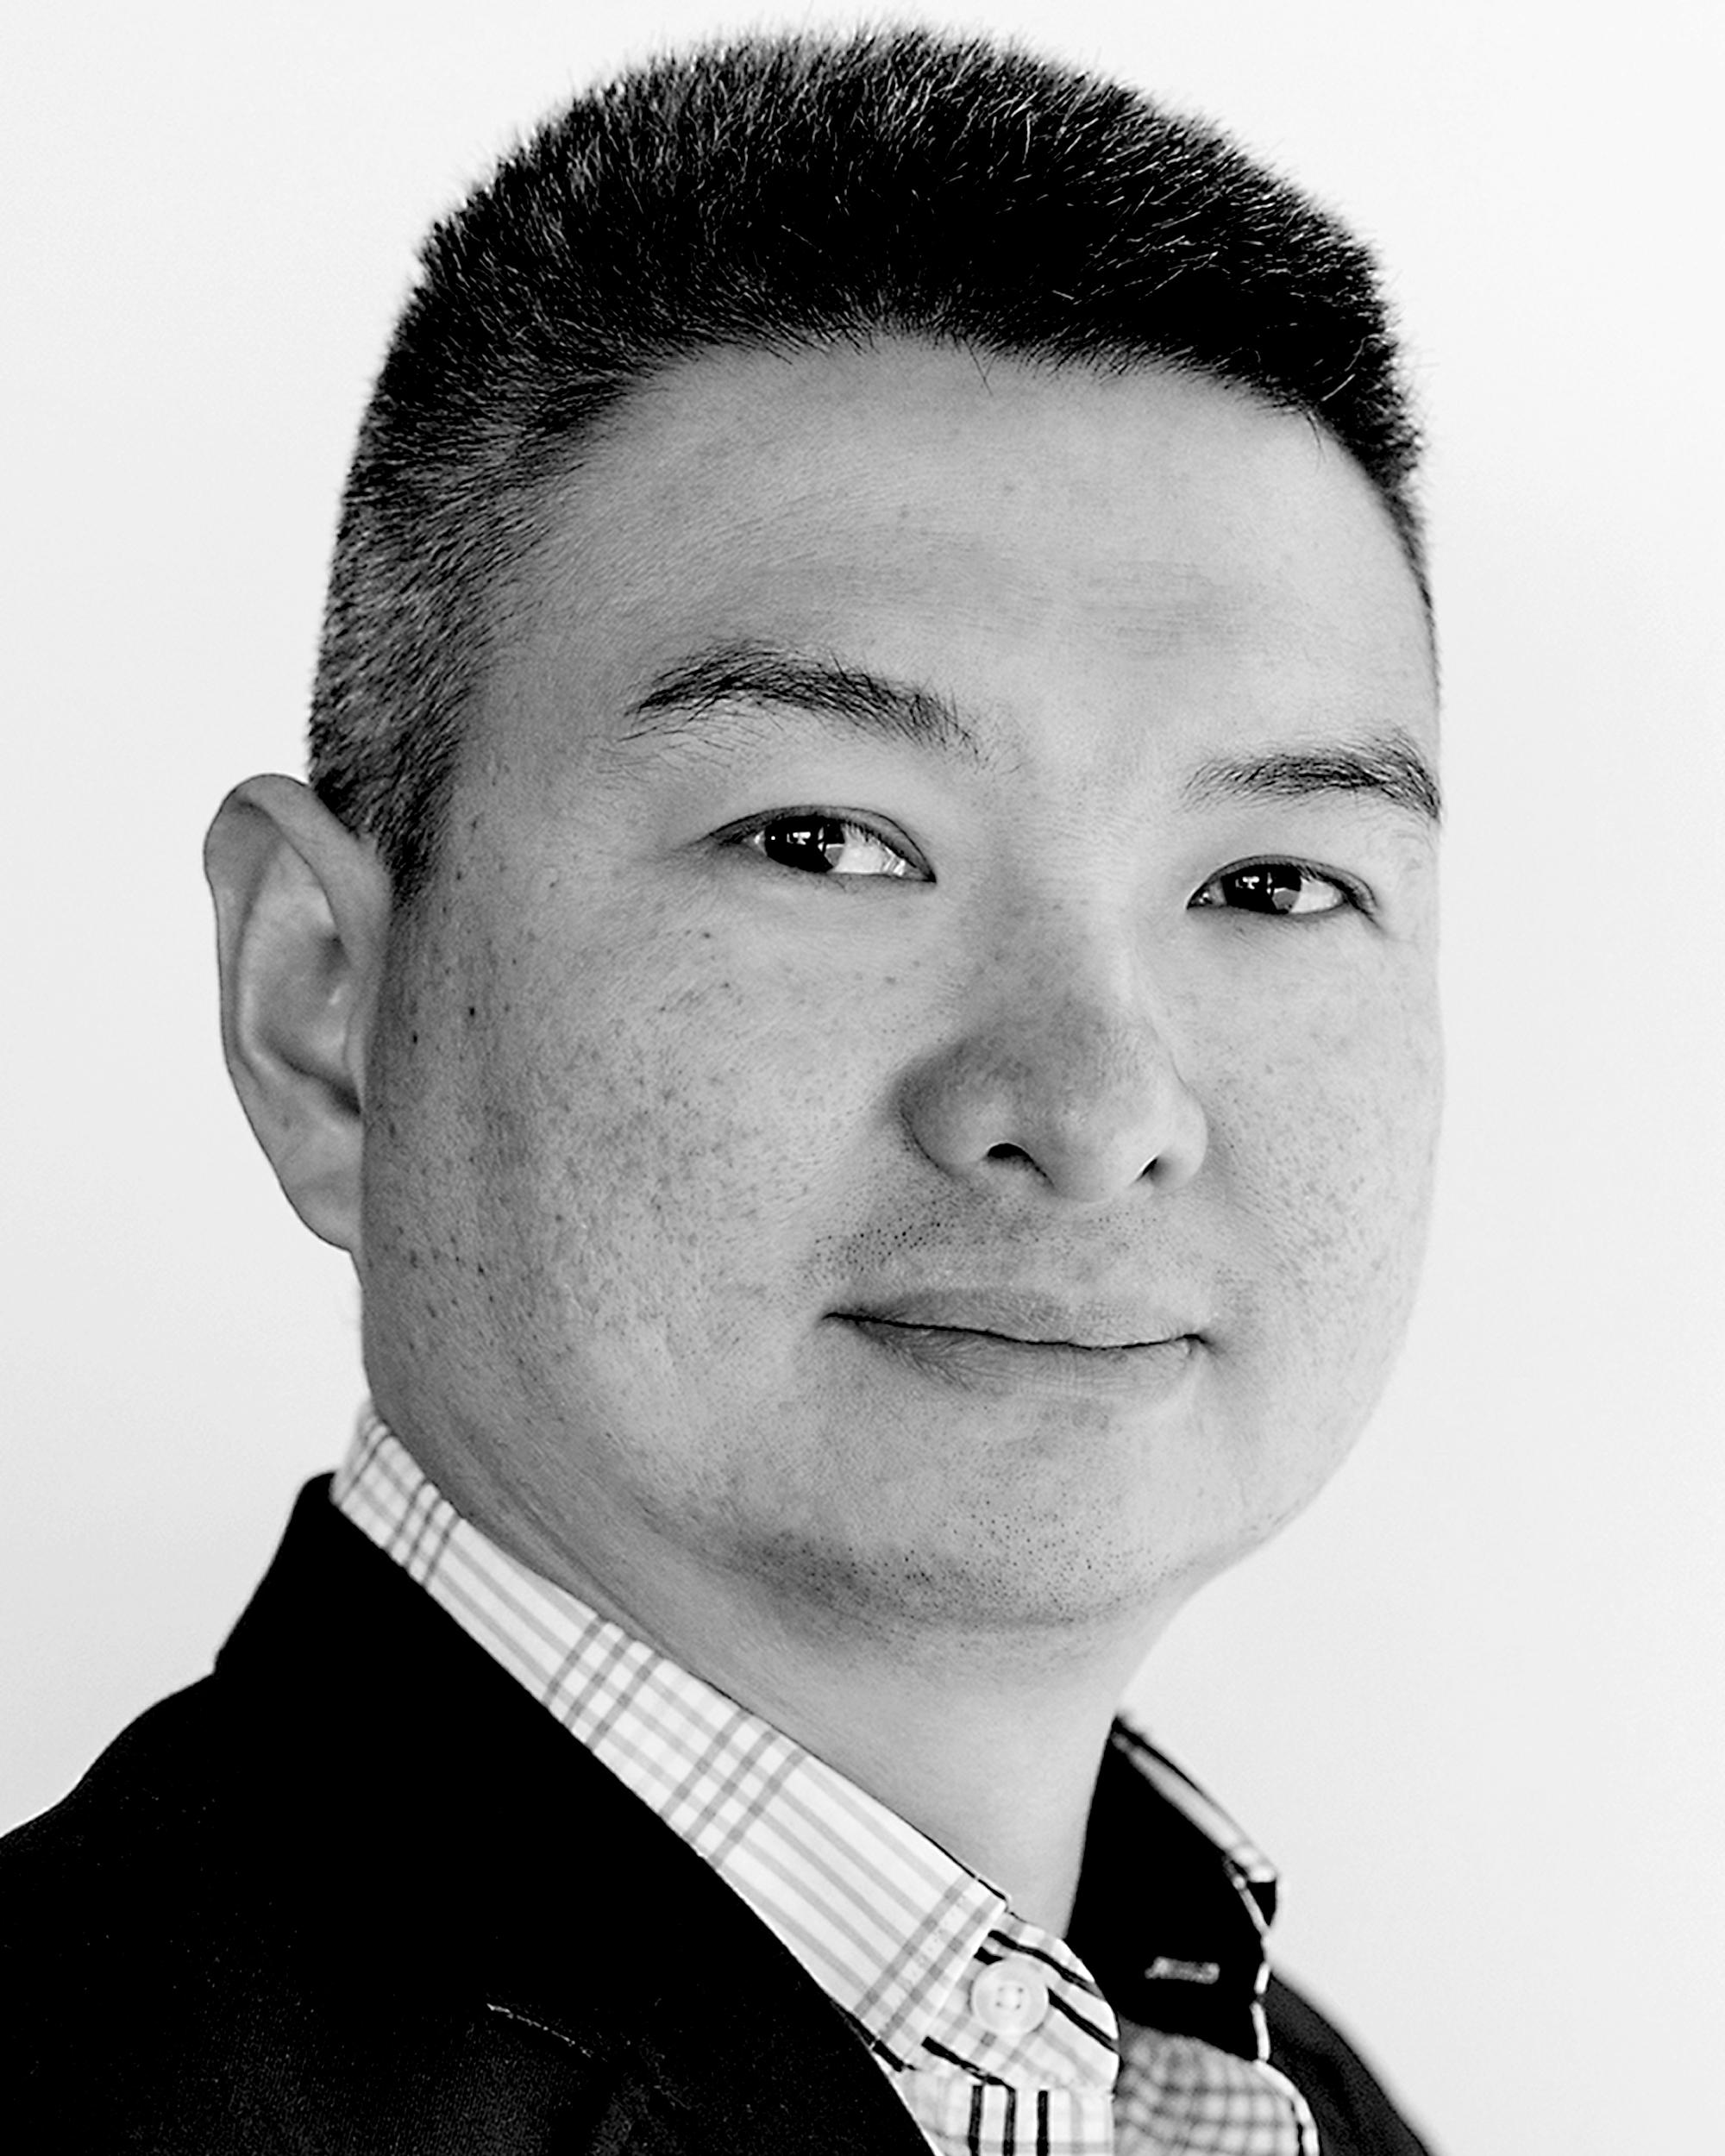 Headshot of Joel Anggala